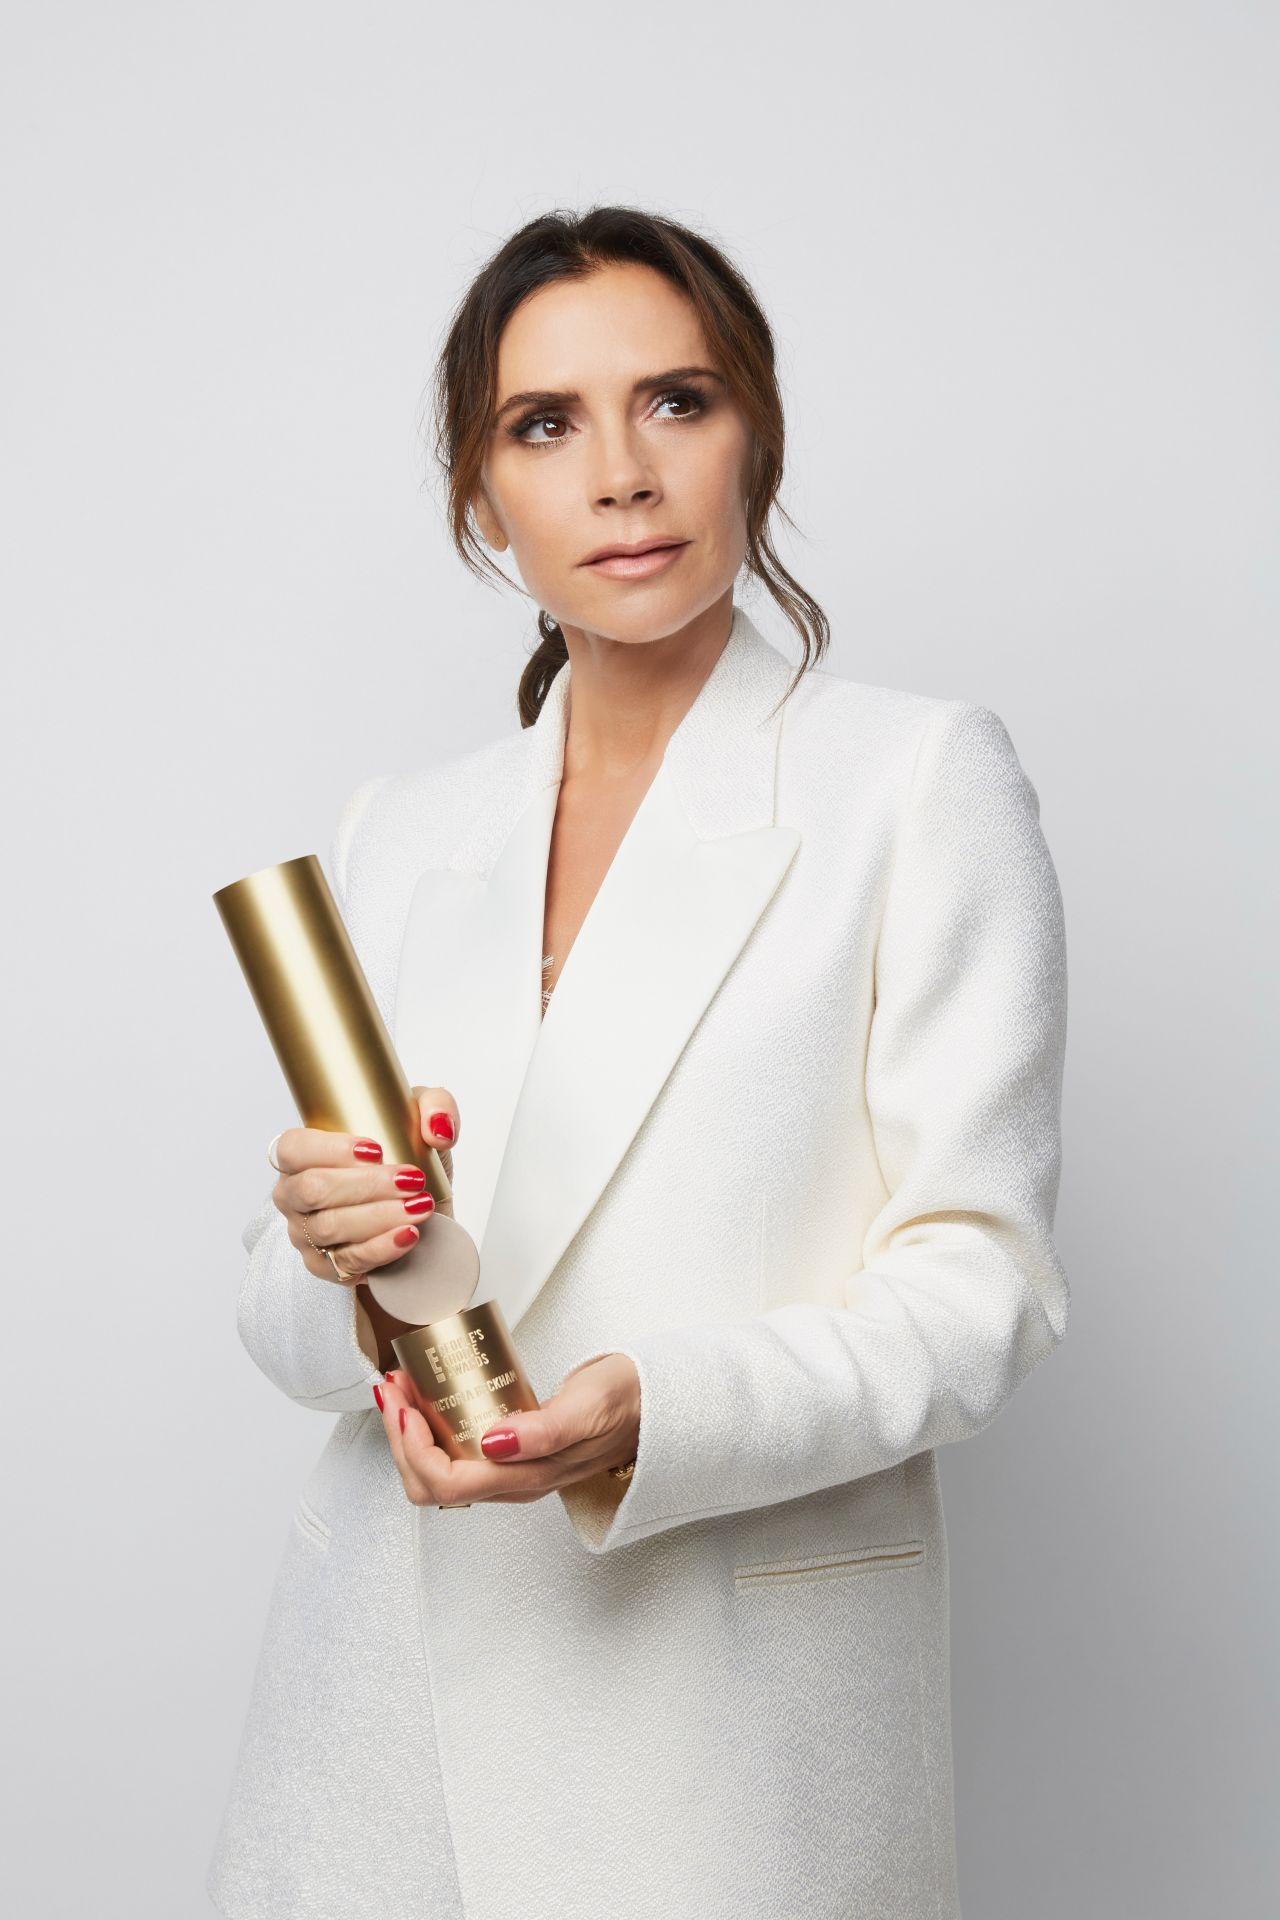 https://celebmafia.com/wp-content/uploads/2018/11/victoria-beckham-2018-people-s-choice-awards-portrait-3.jpg